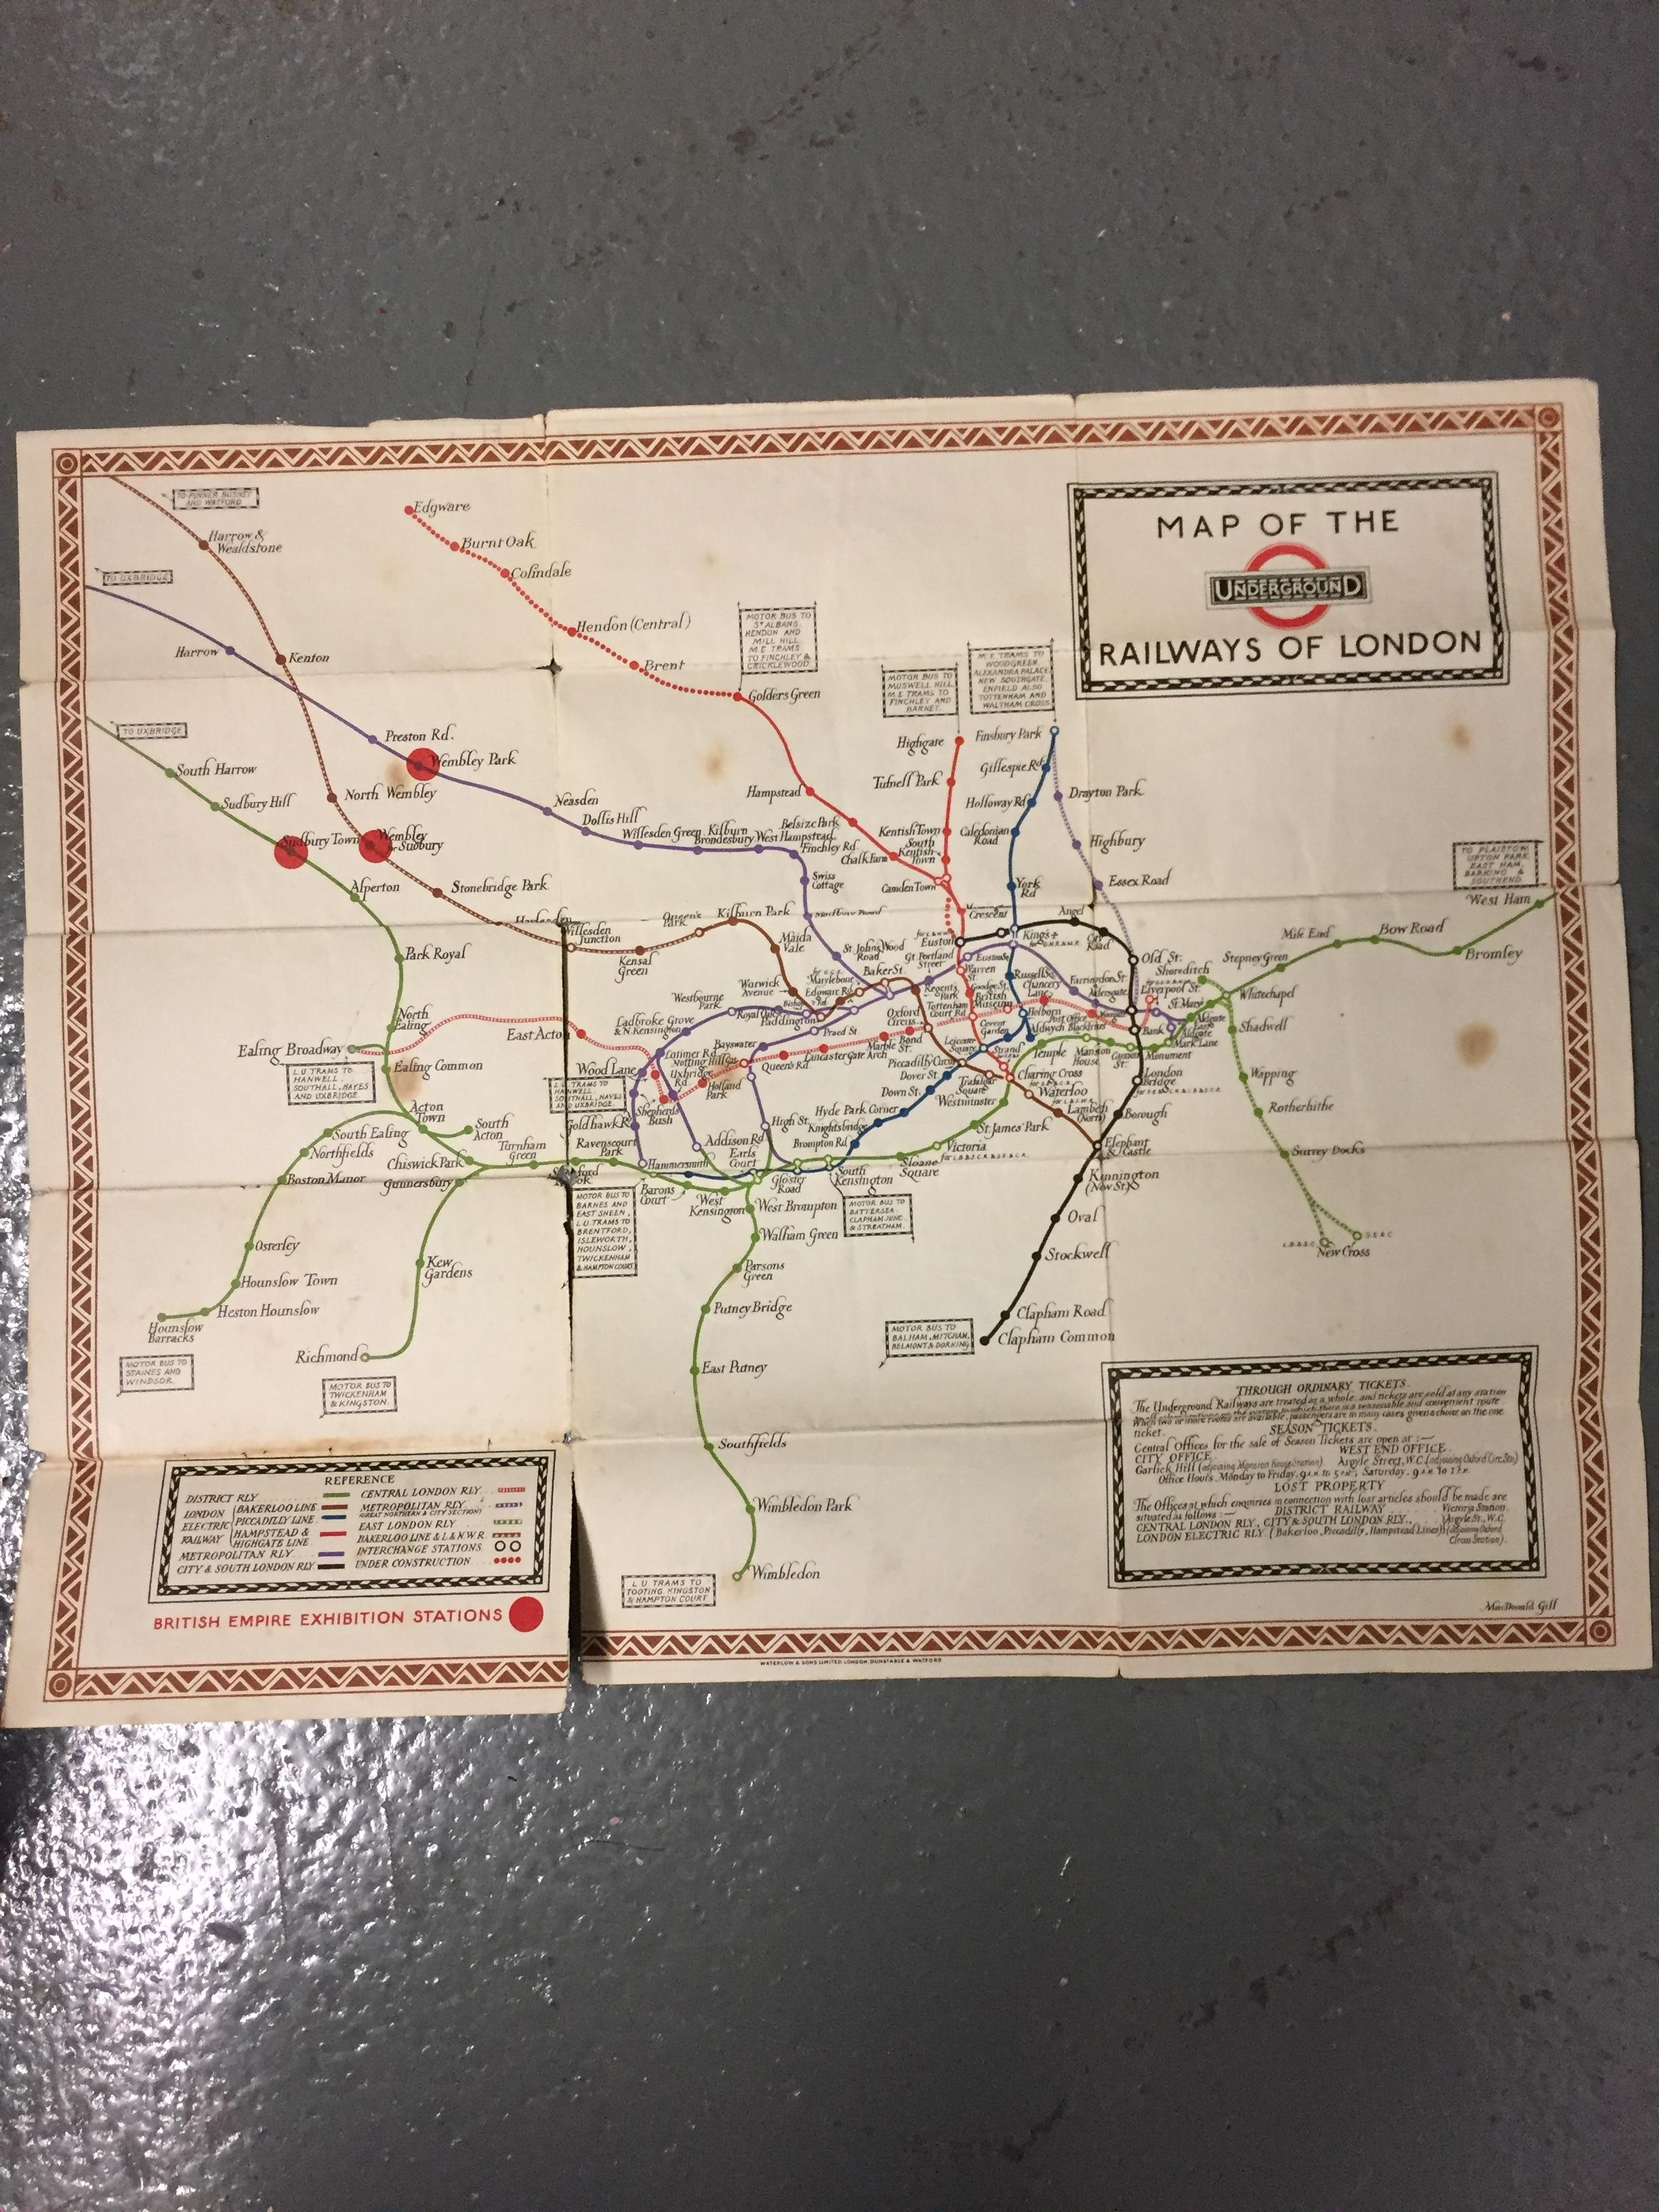 Nine 1910/20s folding pocket maps for London transport,comprising a 1916 General Omnibus Map of some - Image 13 of 15